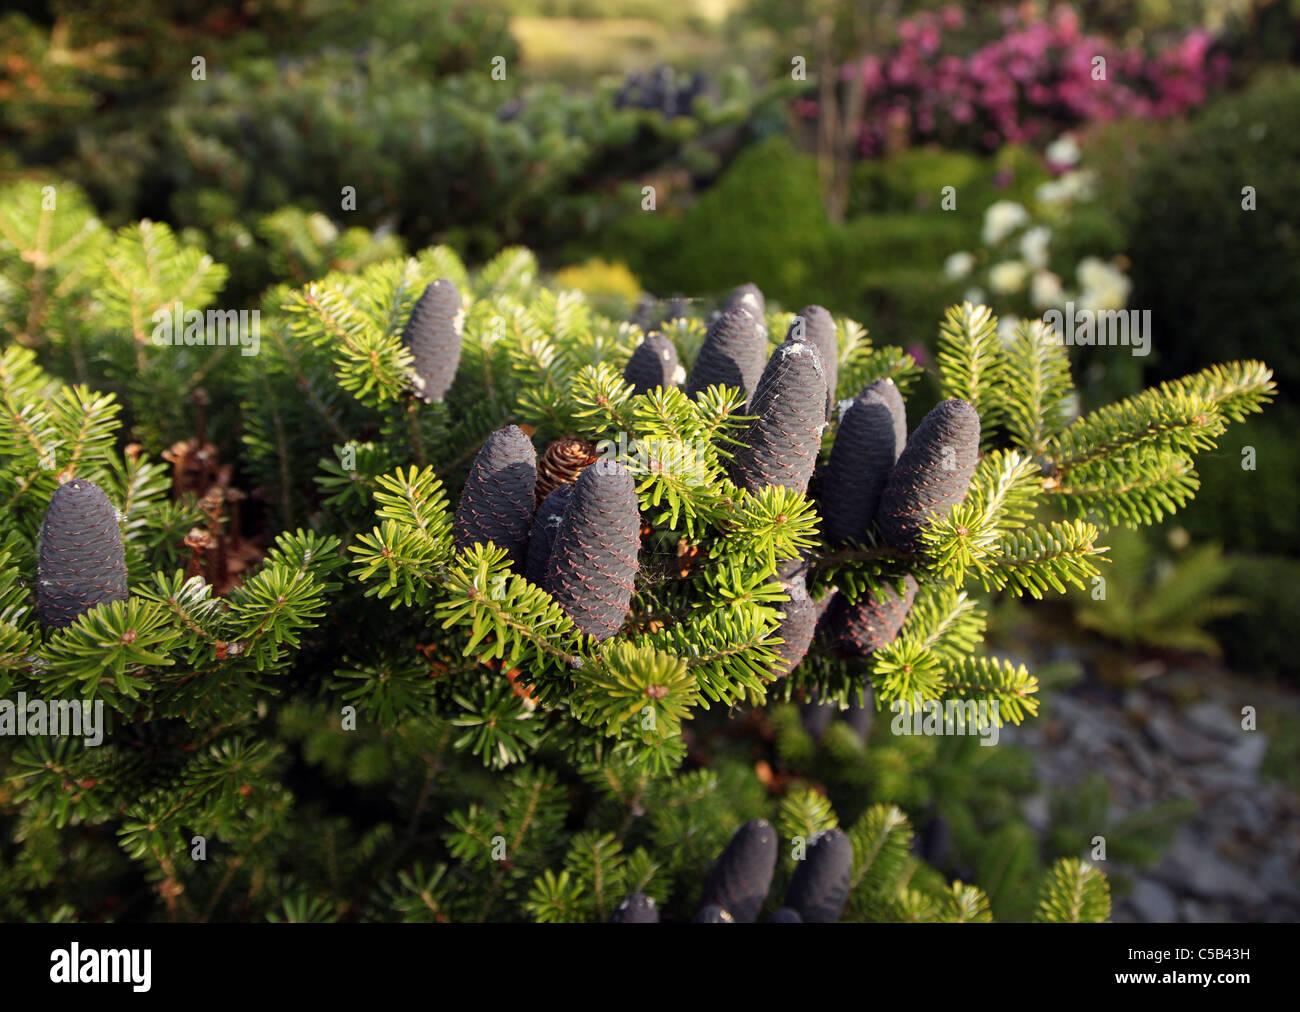 Abies Koreana cones showing seepage of sap - Stock Image